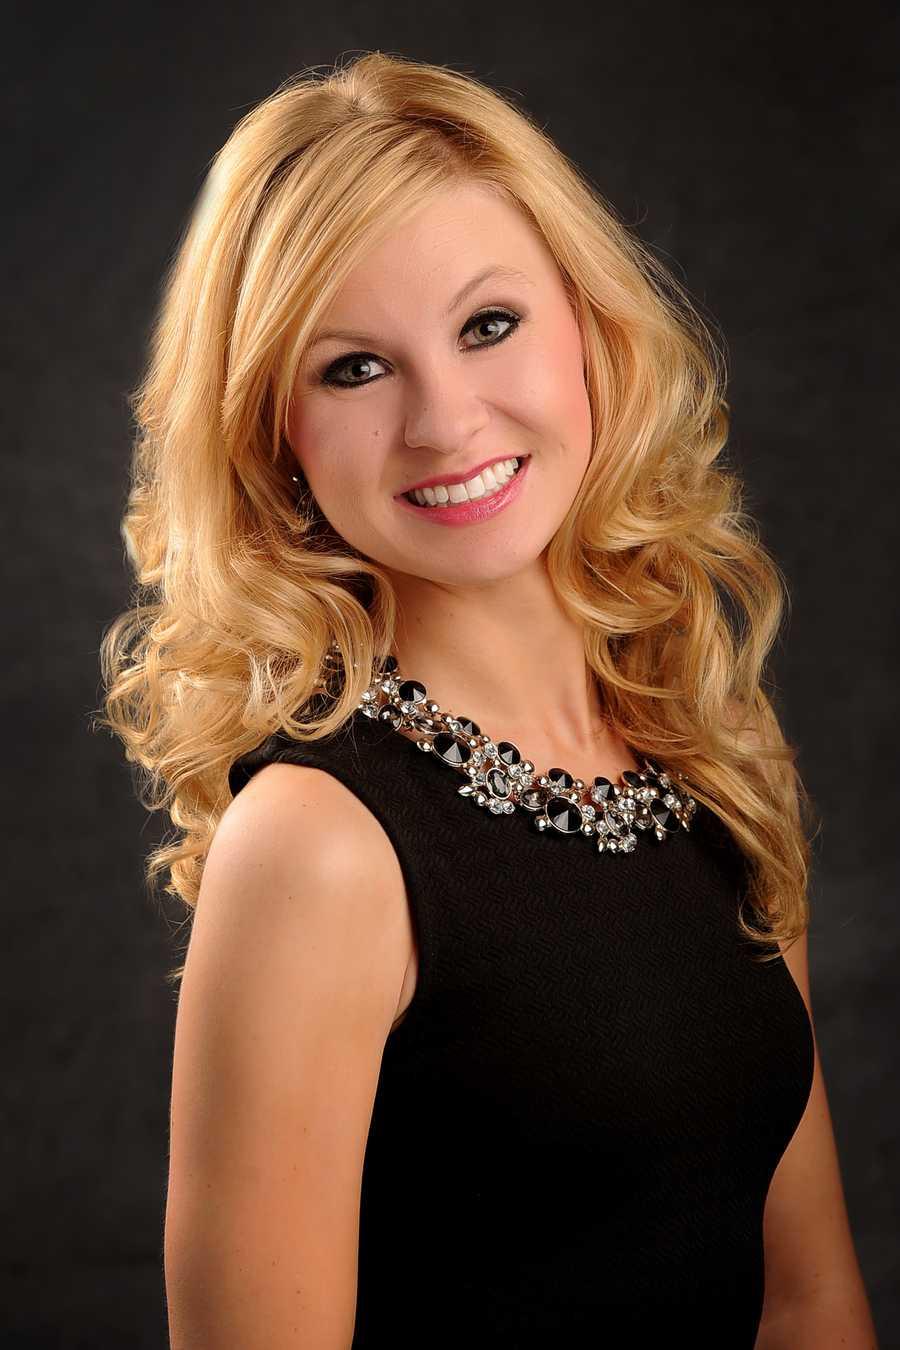 Marissa Livingston, Miss Duke City